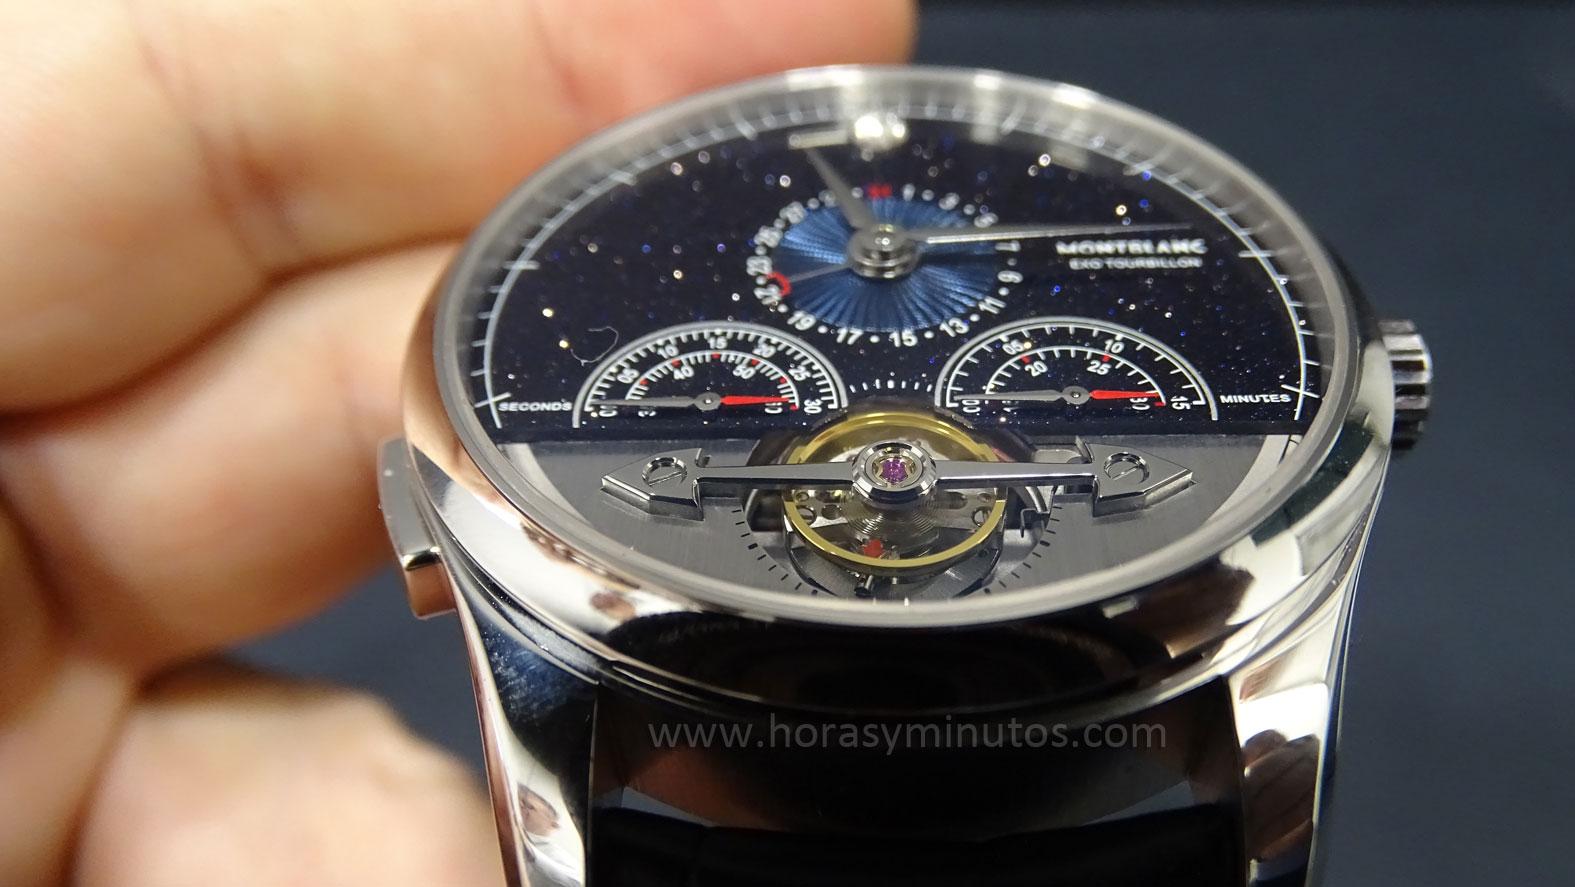 Heritage Chronométrie ExoTourbillon Minute Chronograph Vasco da Gama Limited Edition - Detalle del Tourbillon